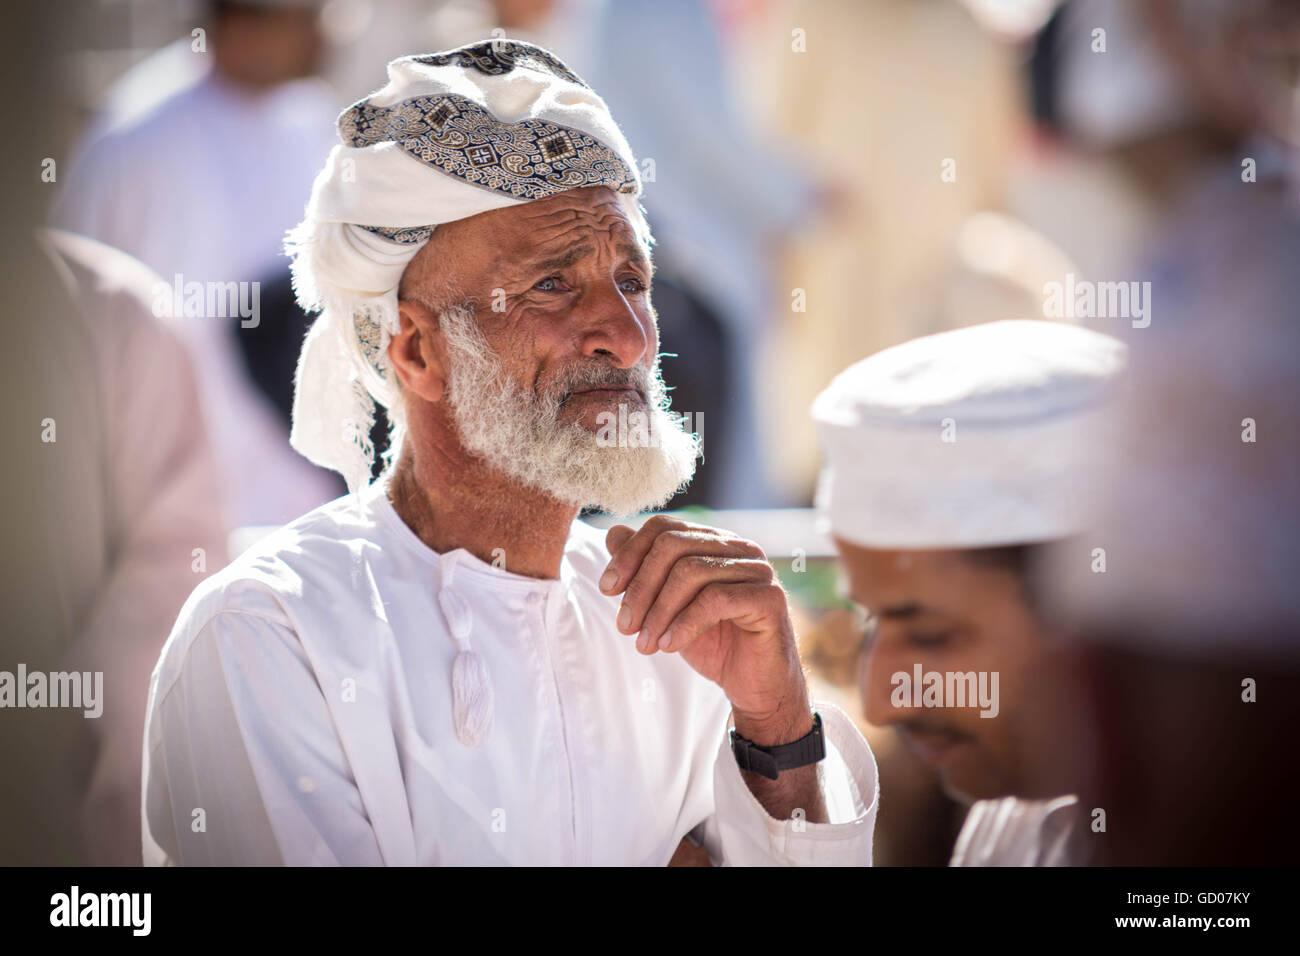 NIZWA, OMAN - 24 APRIL 2015:Omani Greis auf dem traditionellen Markt oder Souk in Nizwa, Oman. Stockbild